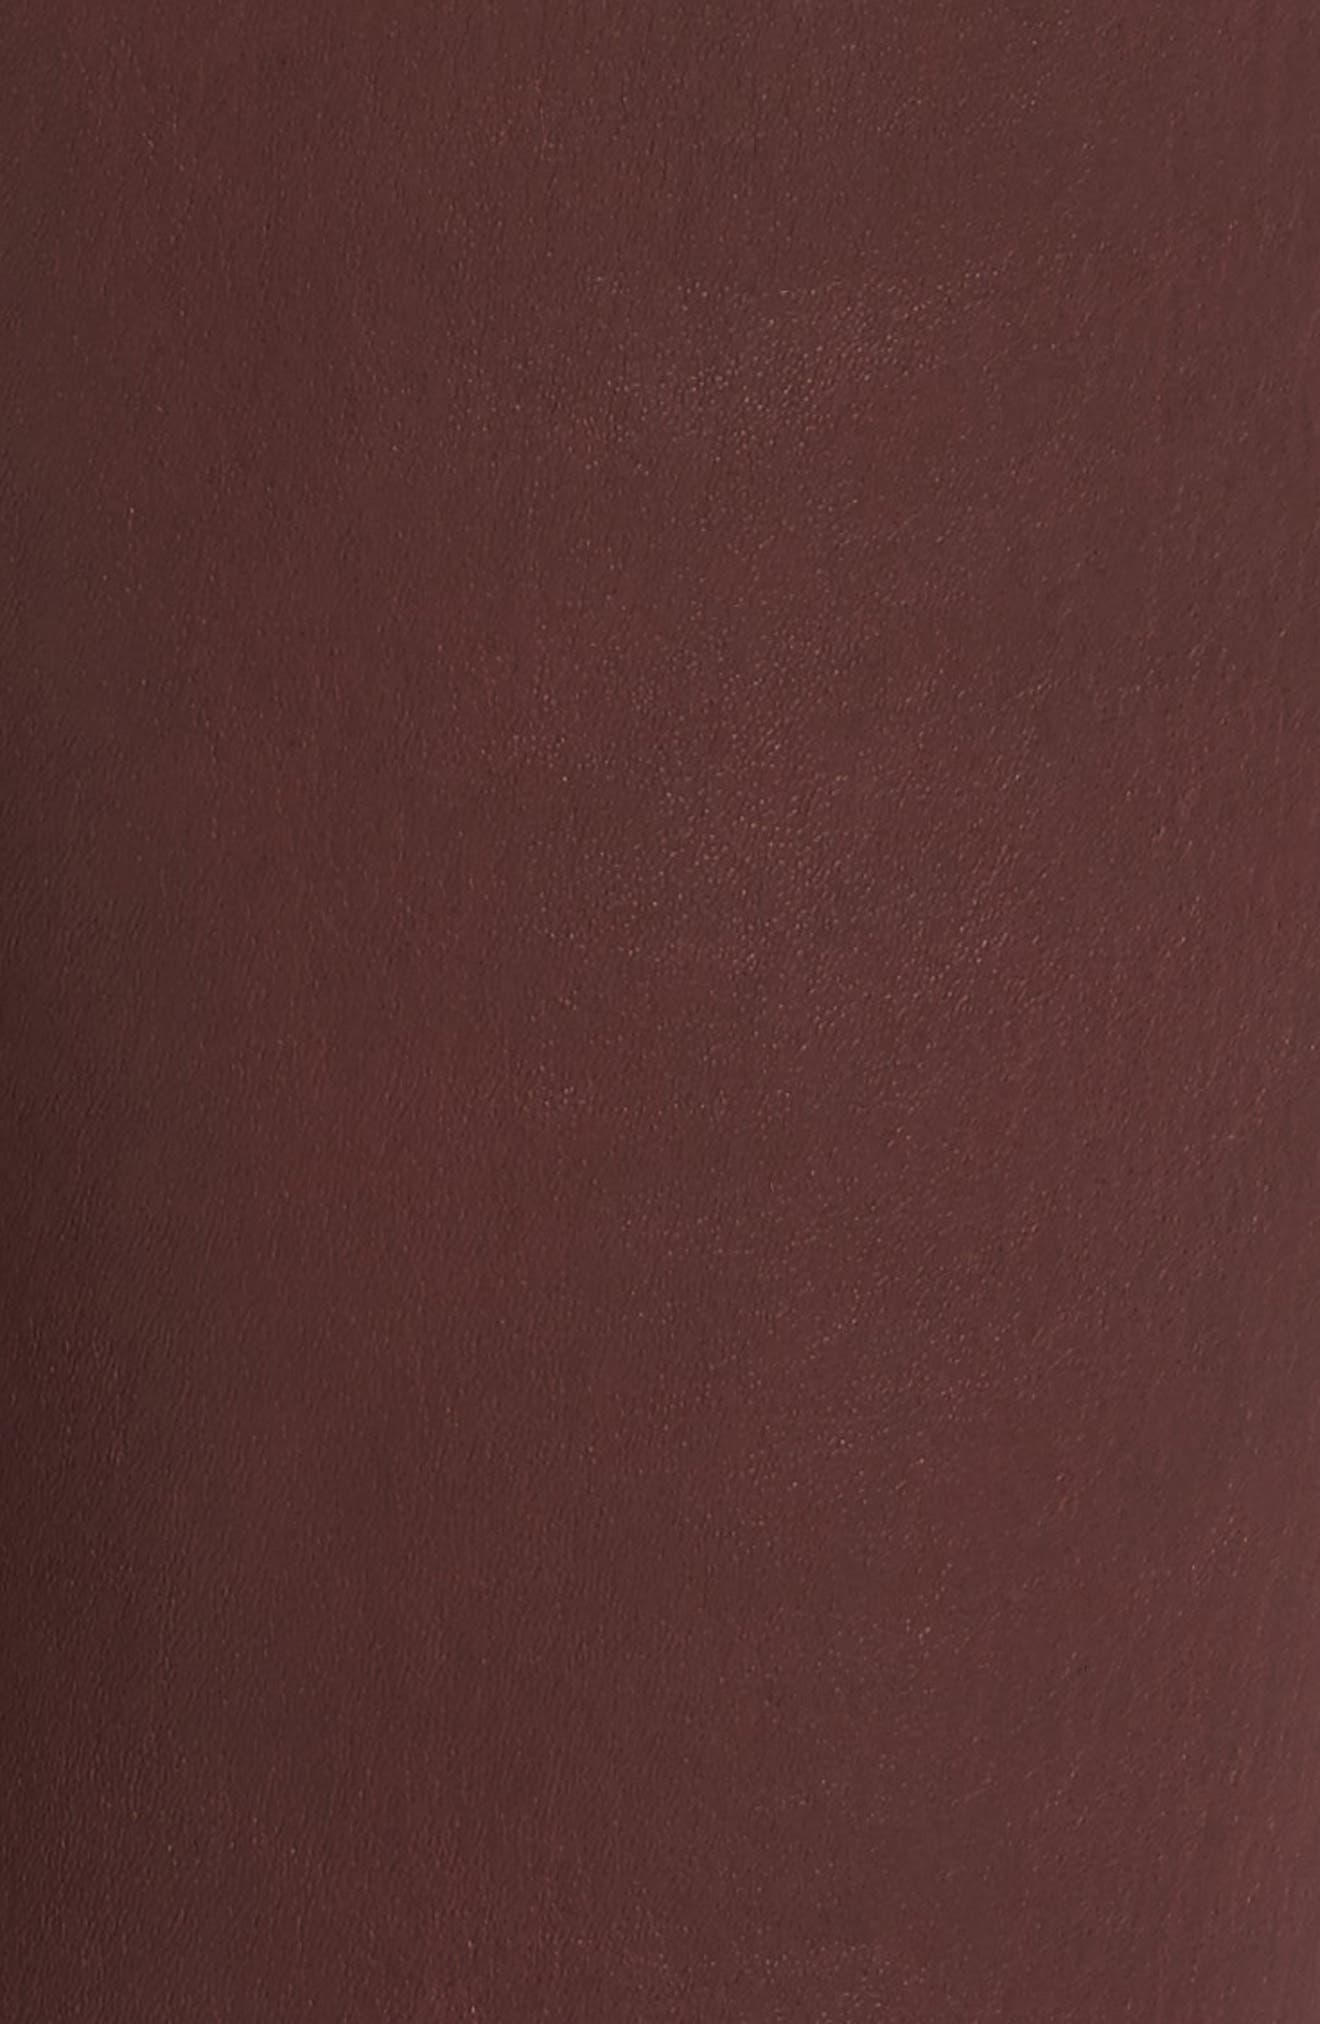 Farrah Leather Skinny Jeans,                             Alternate thumbnail 15, color,